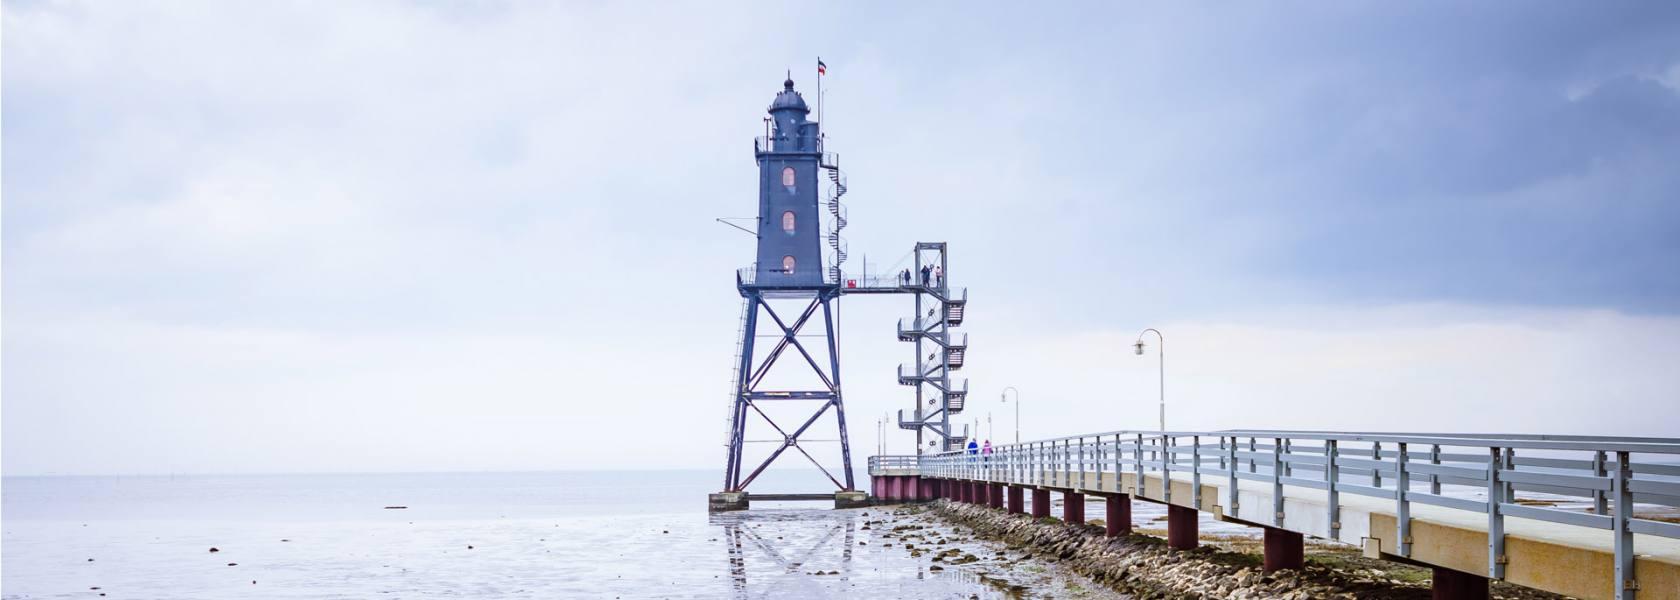 Leuchtturmdenkmal Obereversand, © Tobias Hoiten